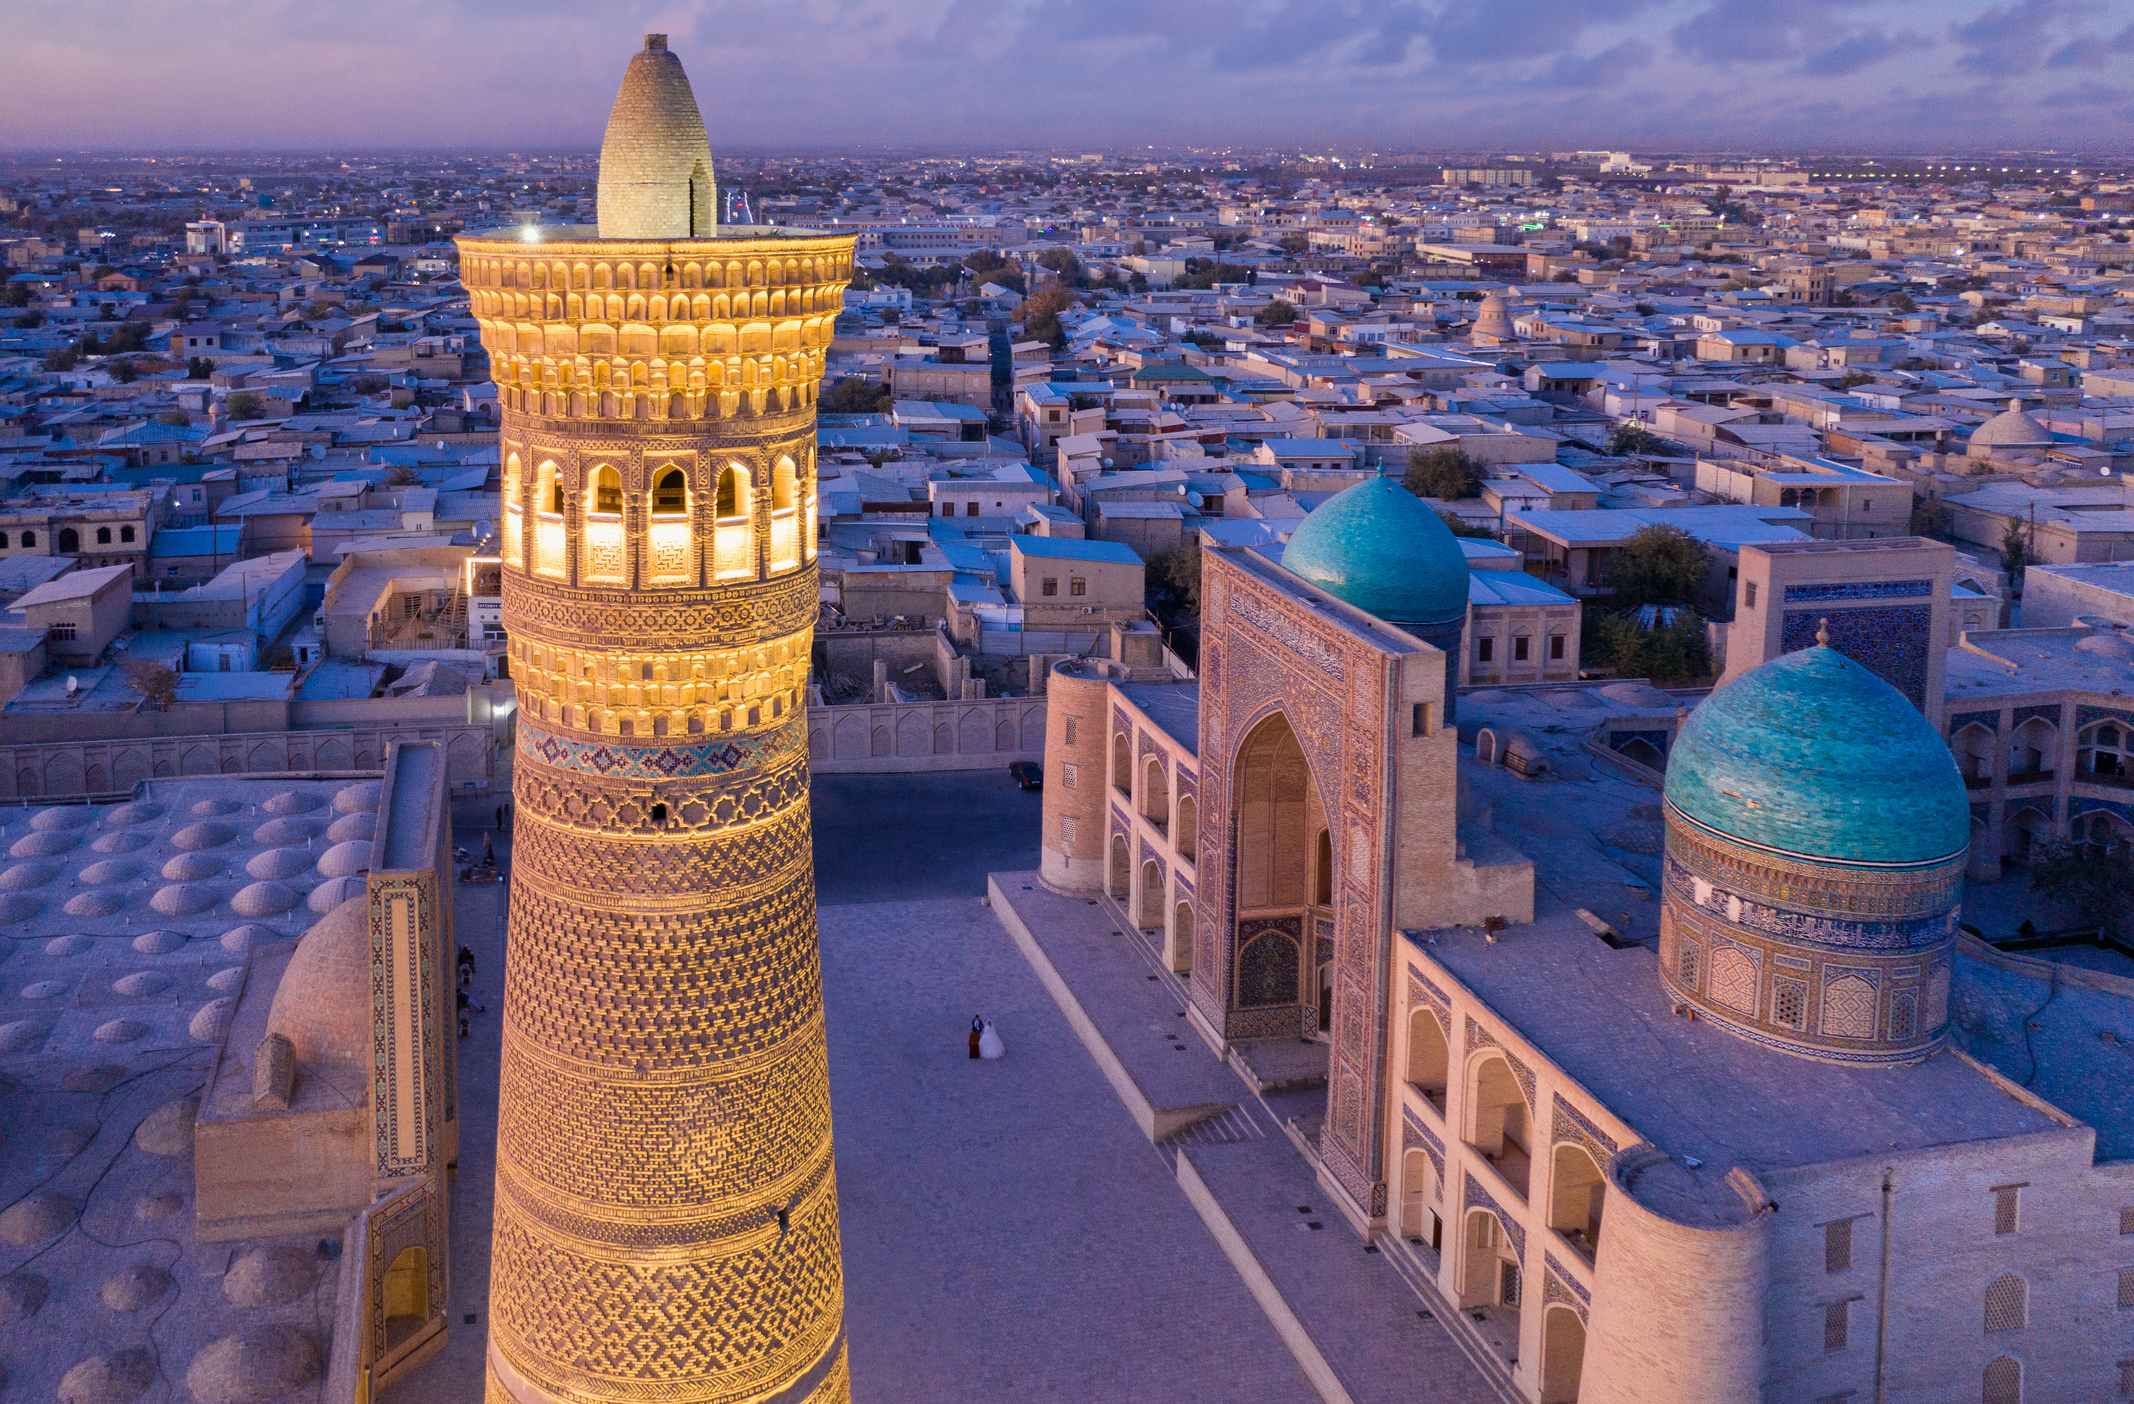 Bukhara Uzbekistan Kalyan Minaret Po-i-Kalyan Sunset Twilight